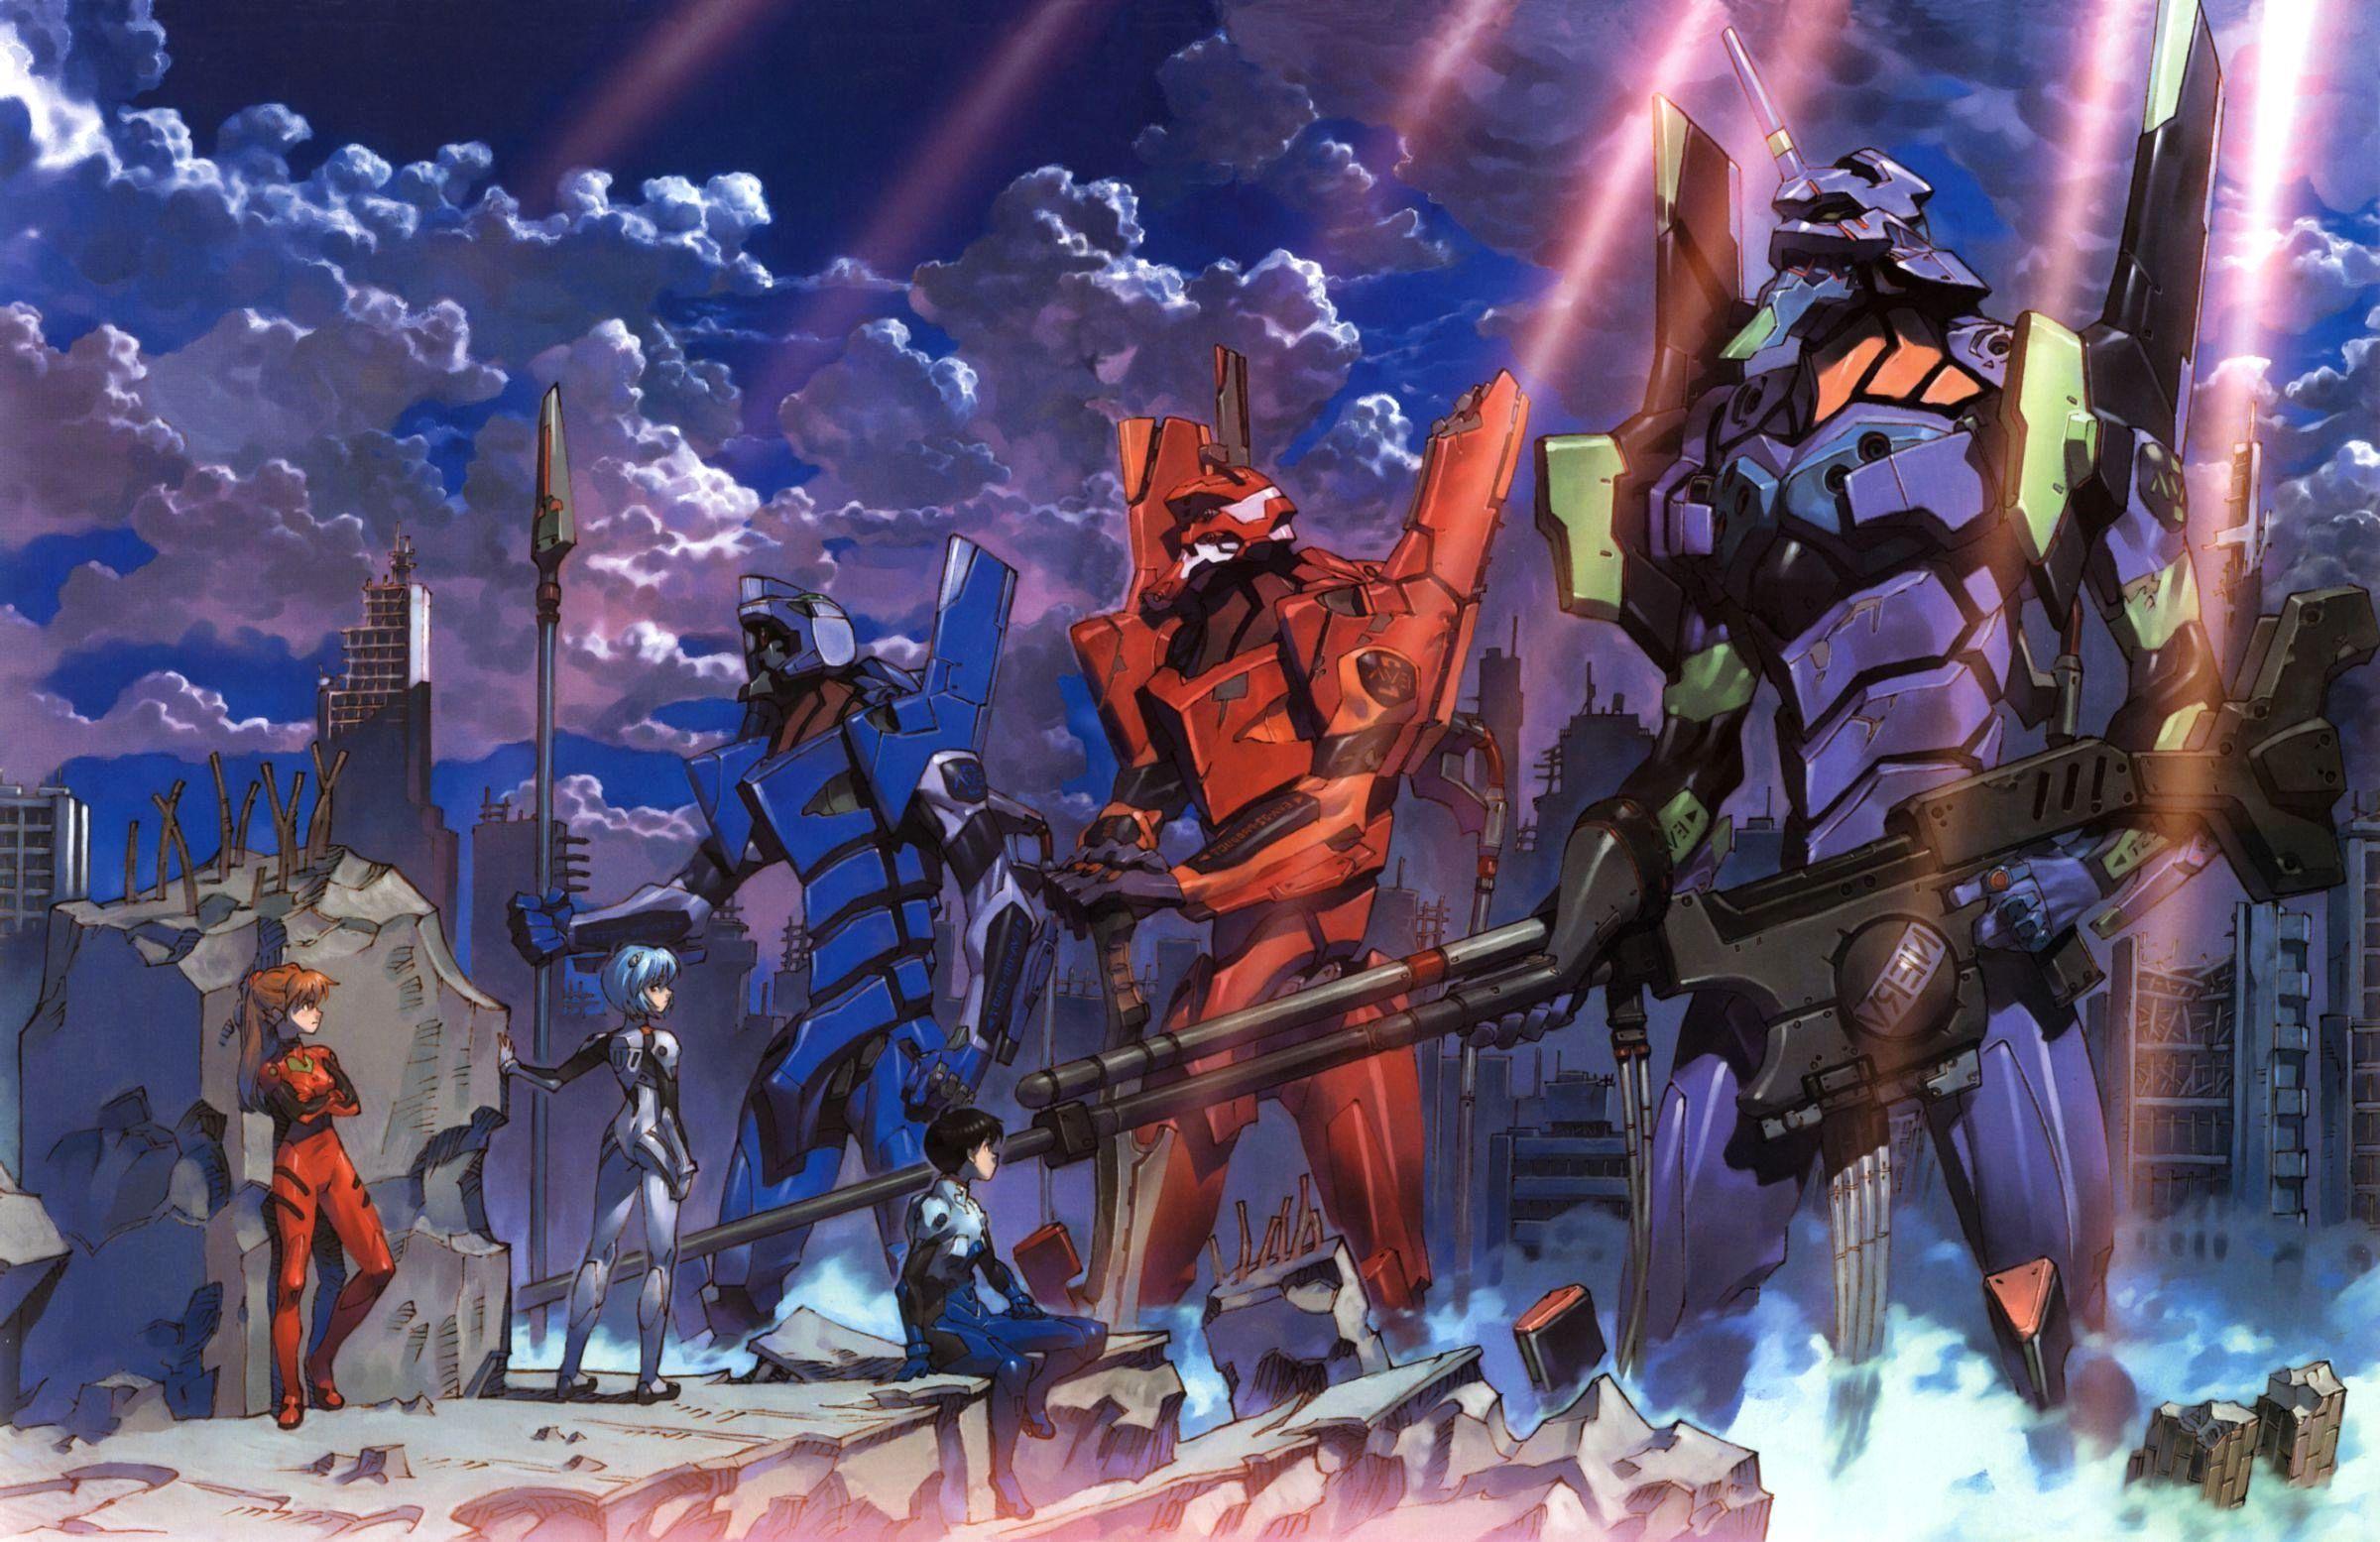 Evangelion Wallpaper 4k Pc Trick En 2020 Neon Genesis Evangelion Evangelion Wallpaper Neogenesis Evangelion